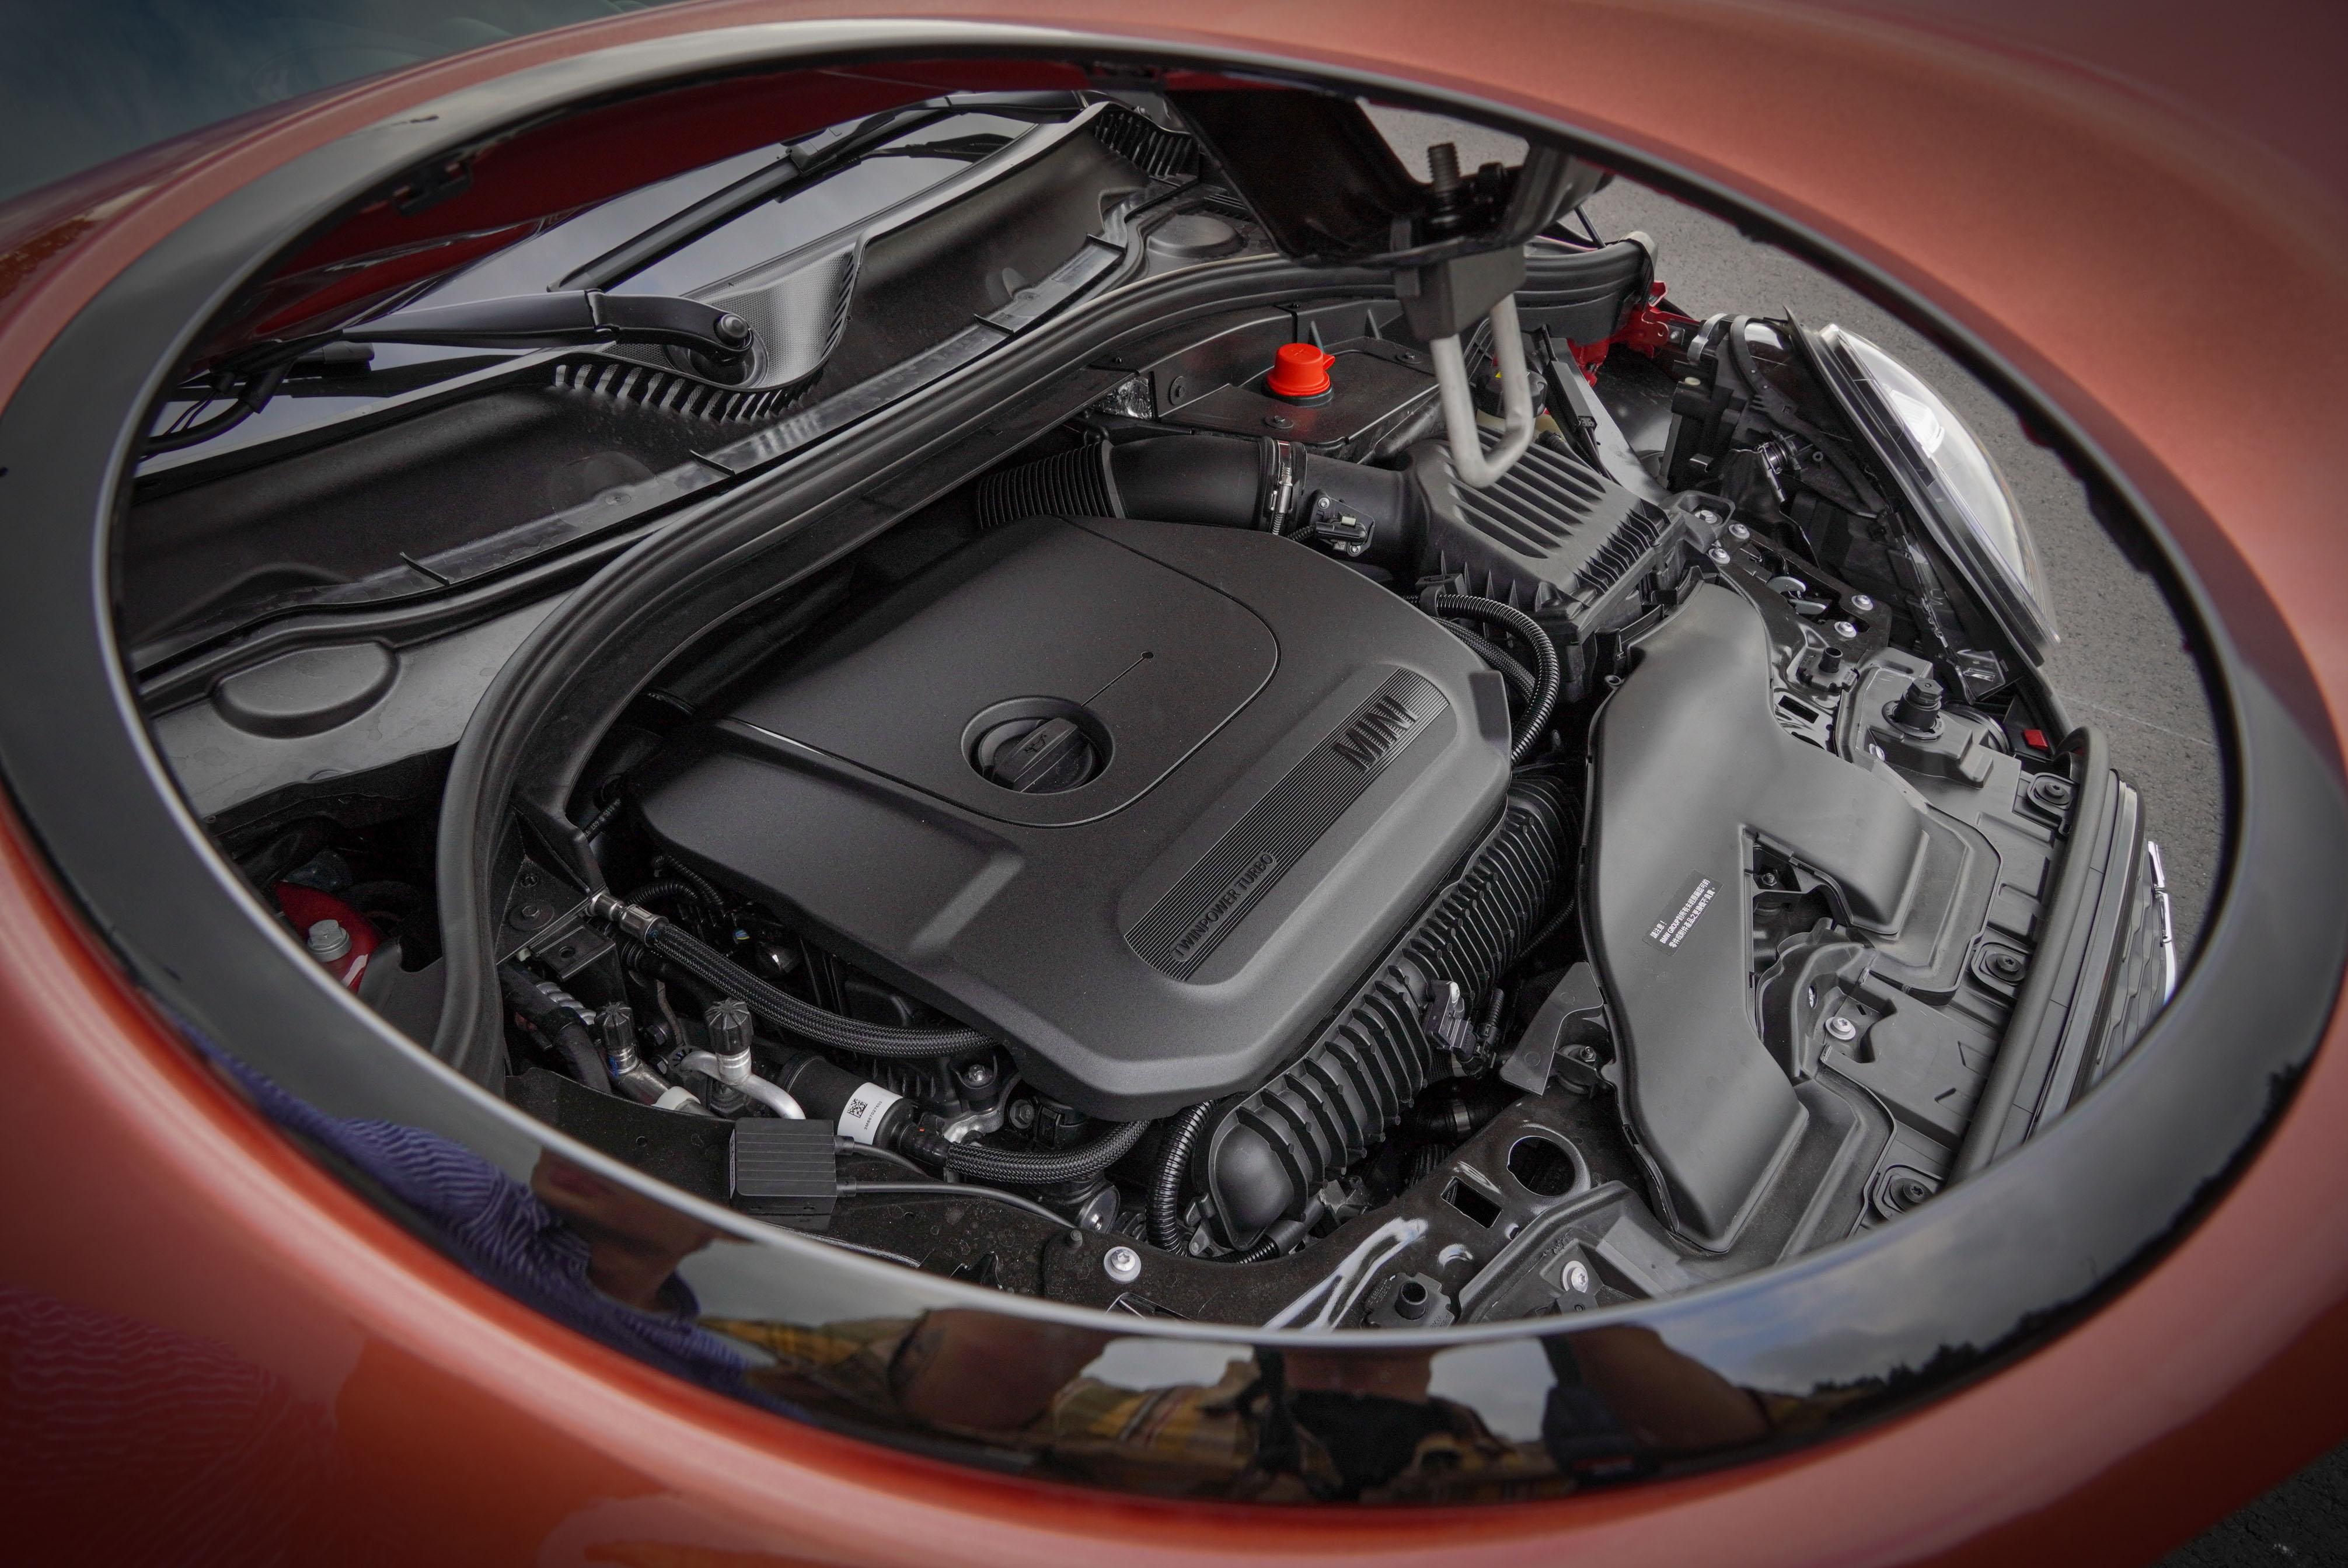 Clubman 這顆源自於 BMW 的 TwinPower Turbo 渦輪增壓直列四汽缸,擁有 192hp/5000-6000 rpm,280 Nm/1350-4600 rpm 的動力數據,0-100 km/h 加速時間為 7.2 秒。